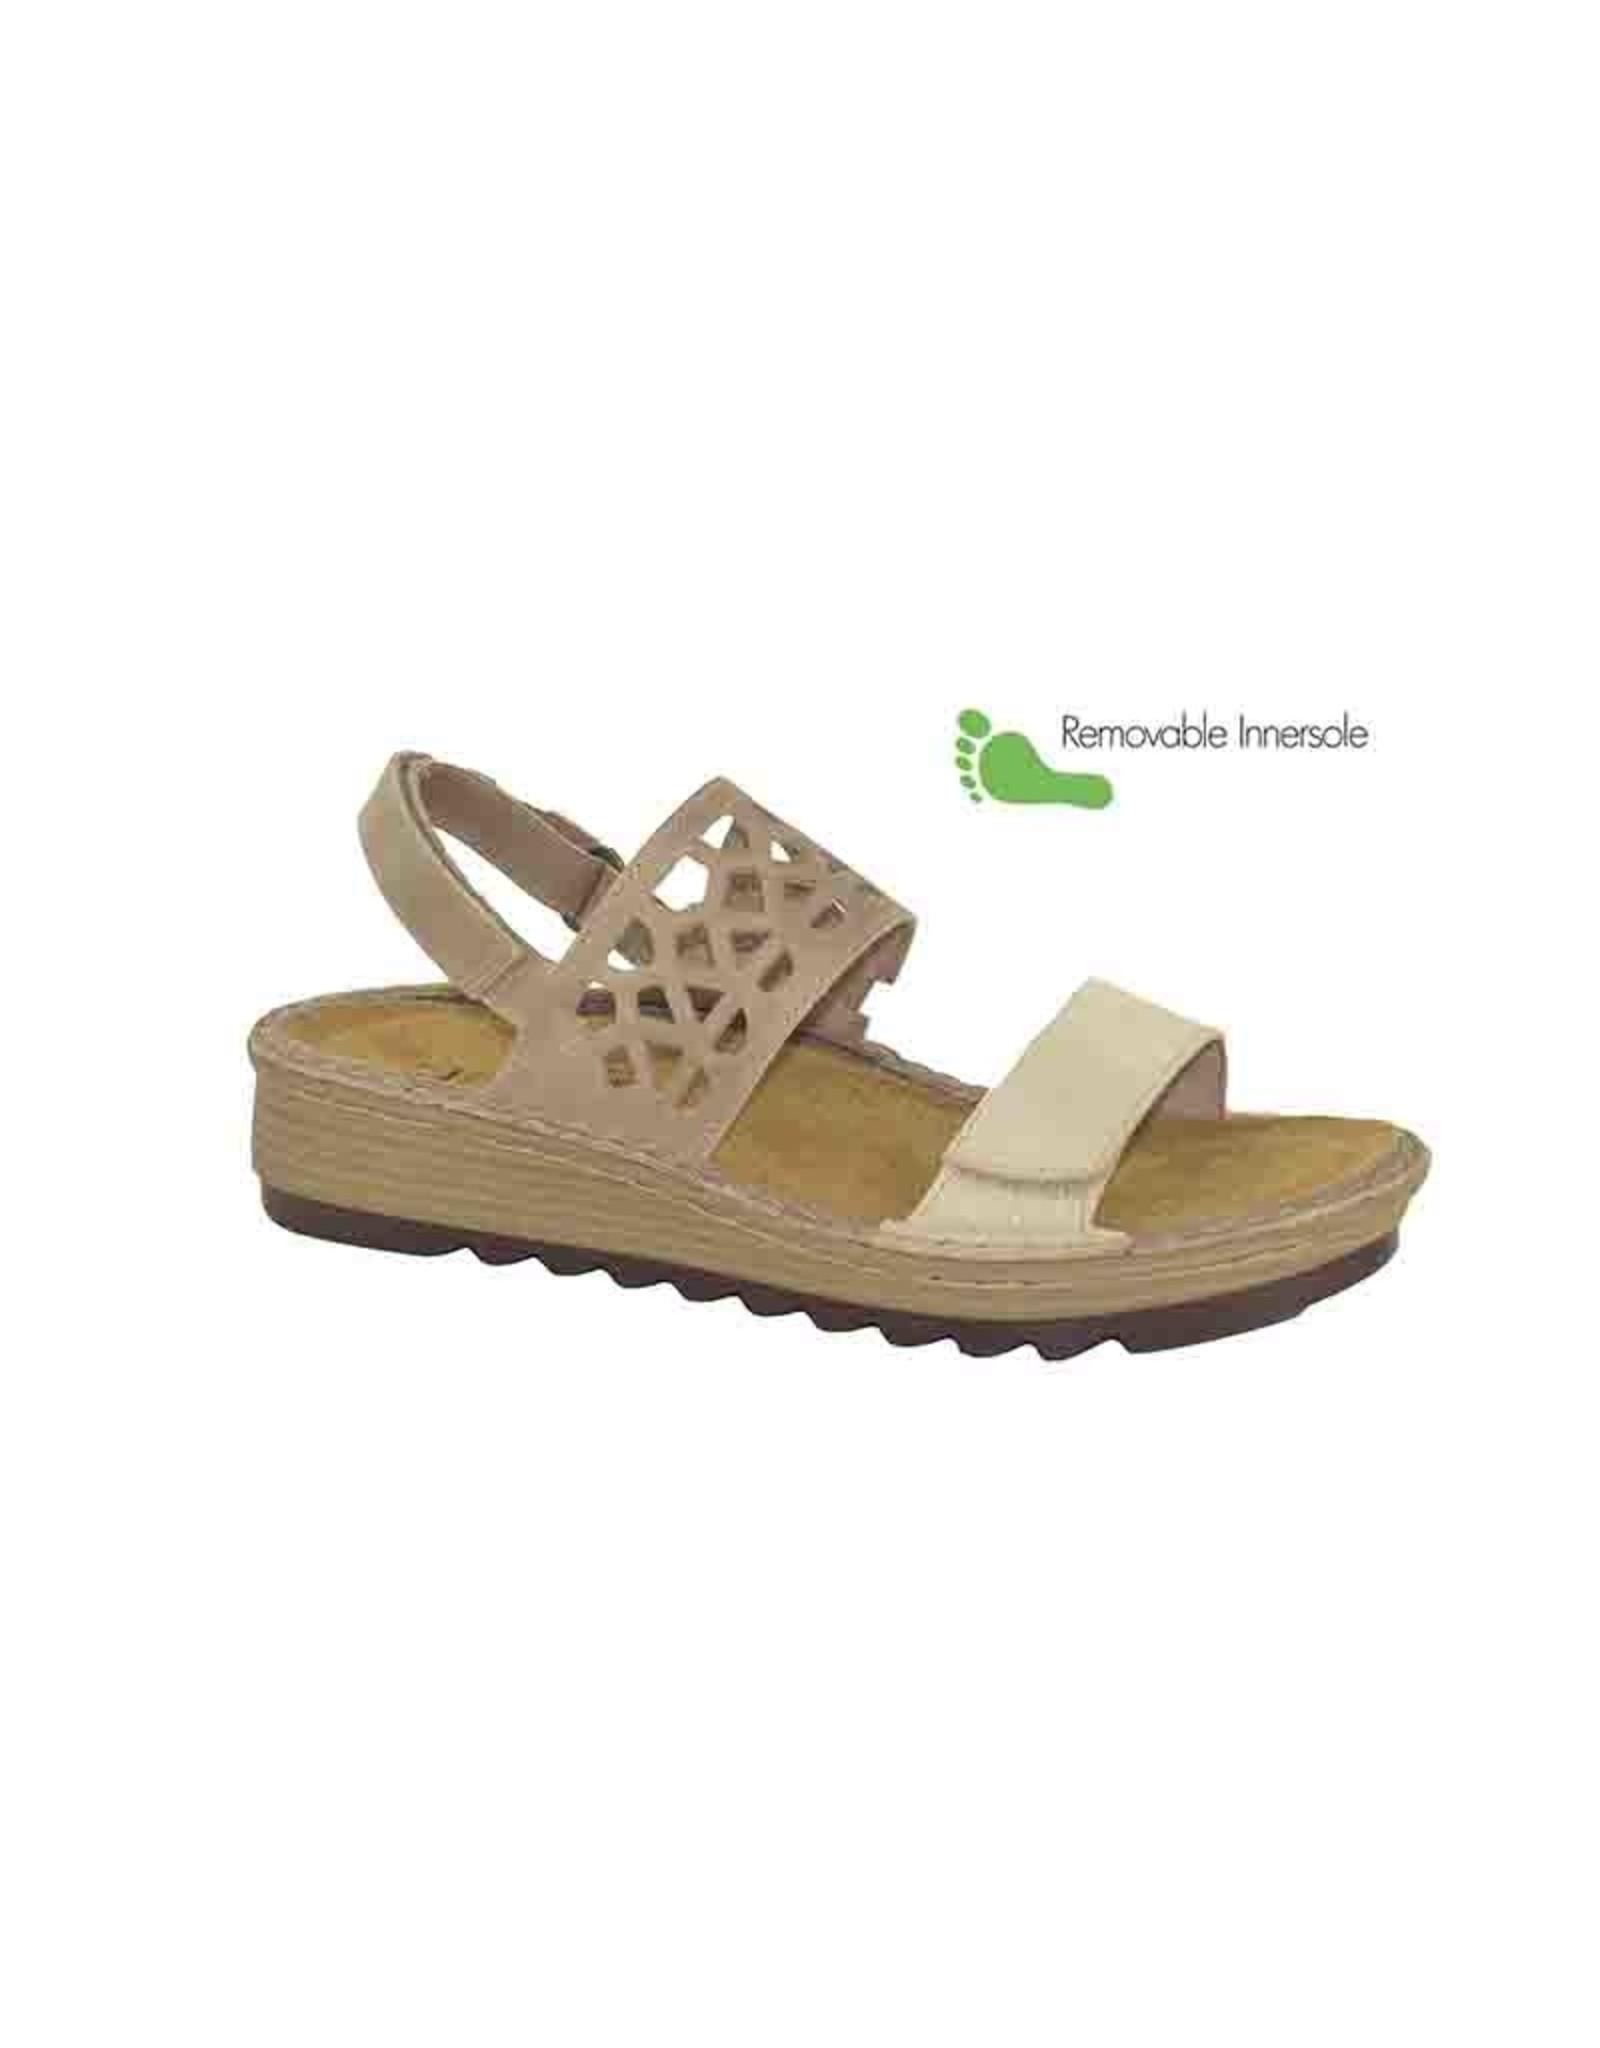 Naot Footwear Acacia in Gold Tread Khaki